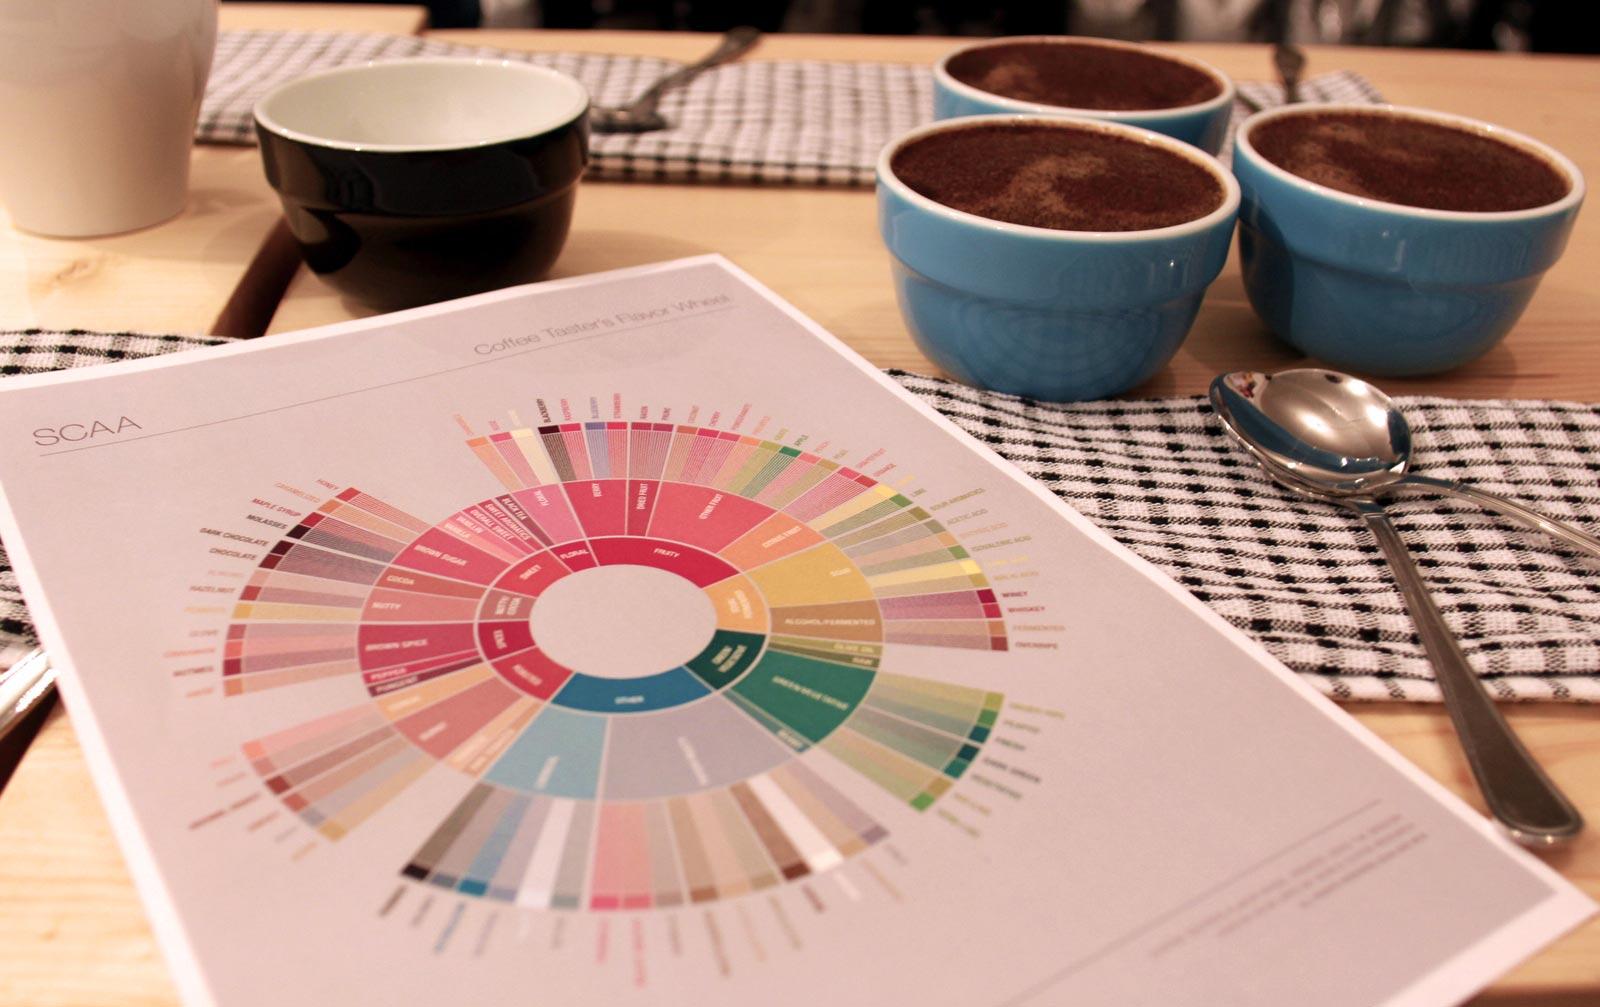 Aromarad für Kaffee